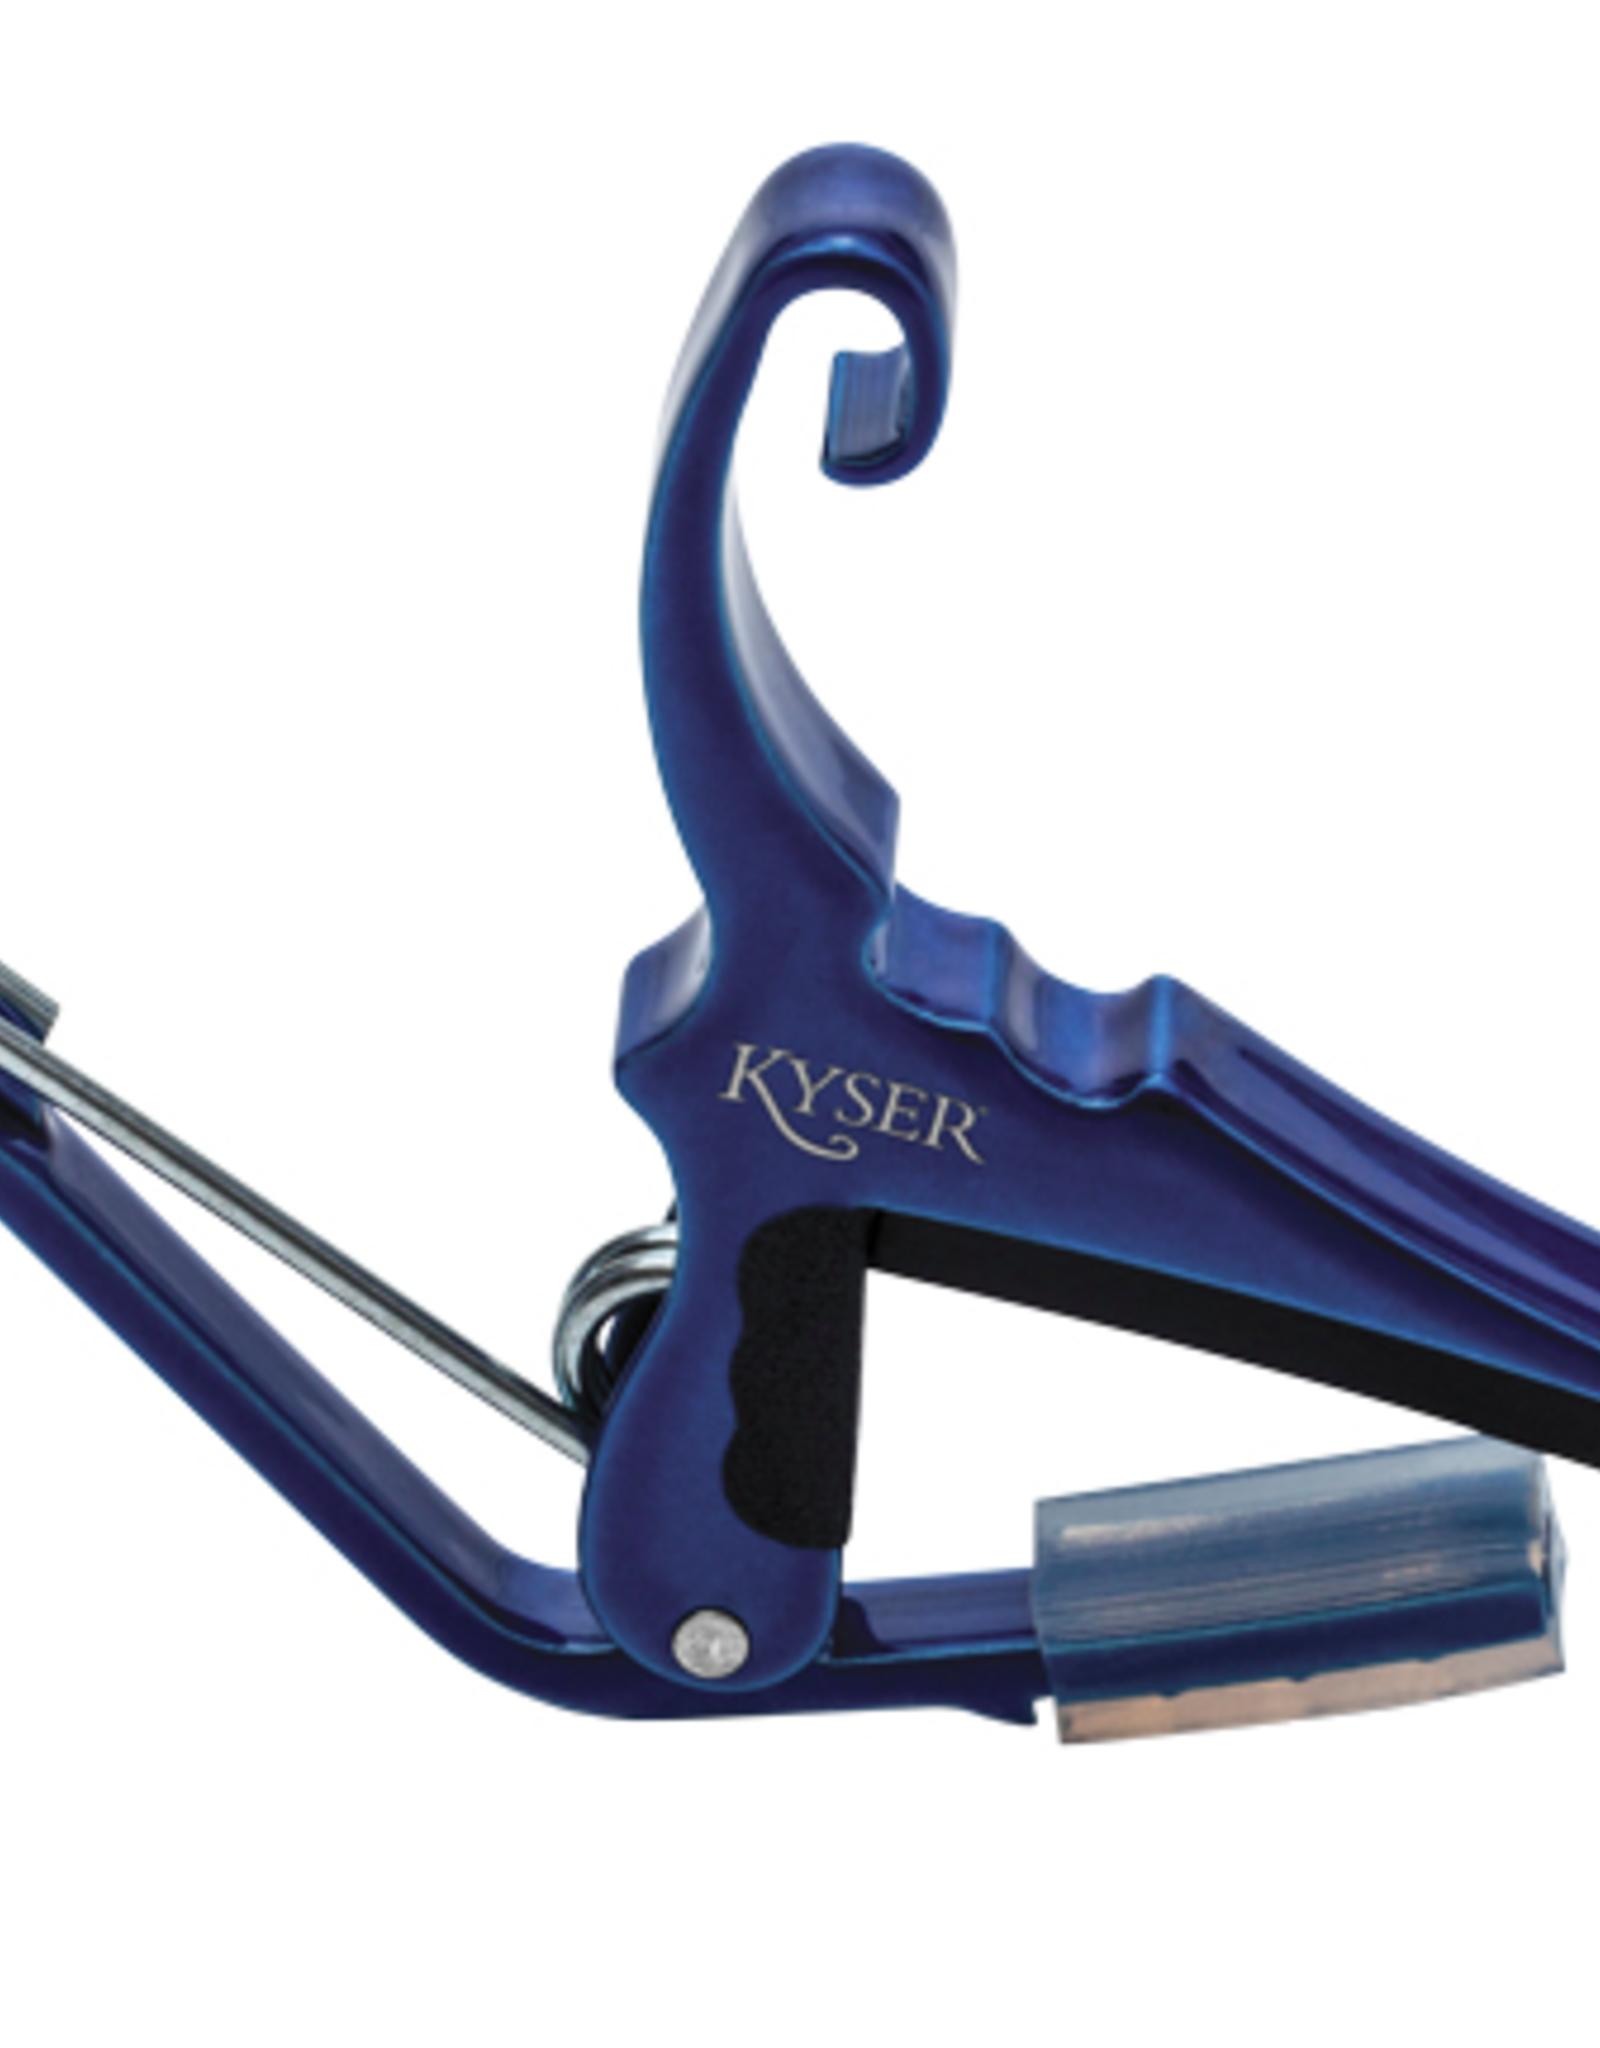 Kyser KYSER QUICK-CHANGE GUITAR CAPO BLUE